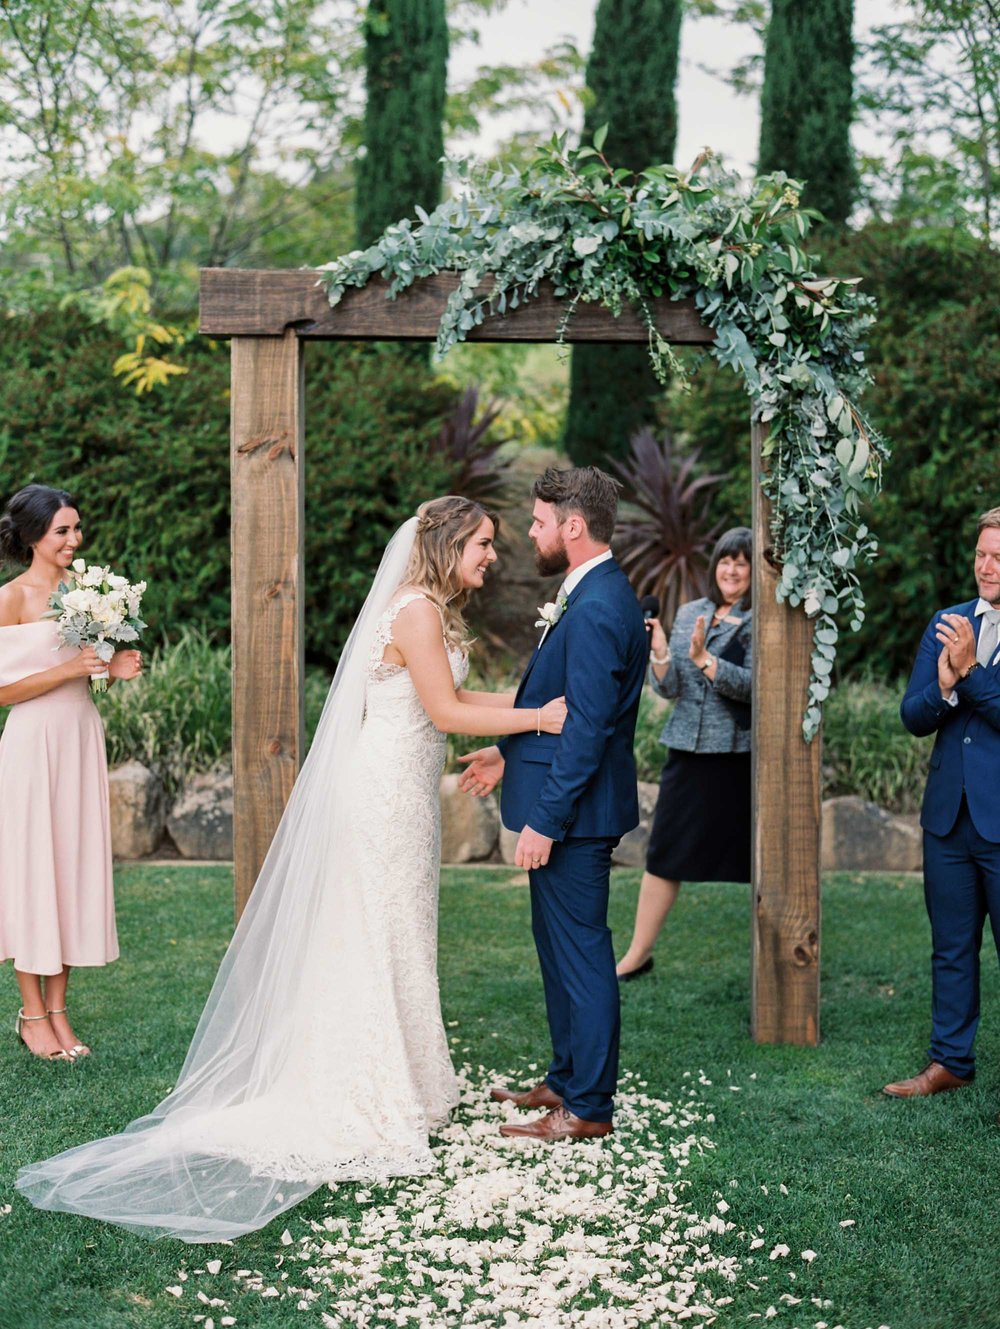 Golding-Wines-wedding-photography-058.jpg